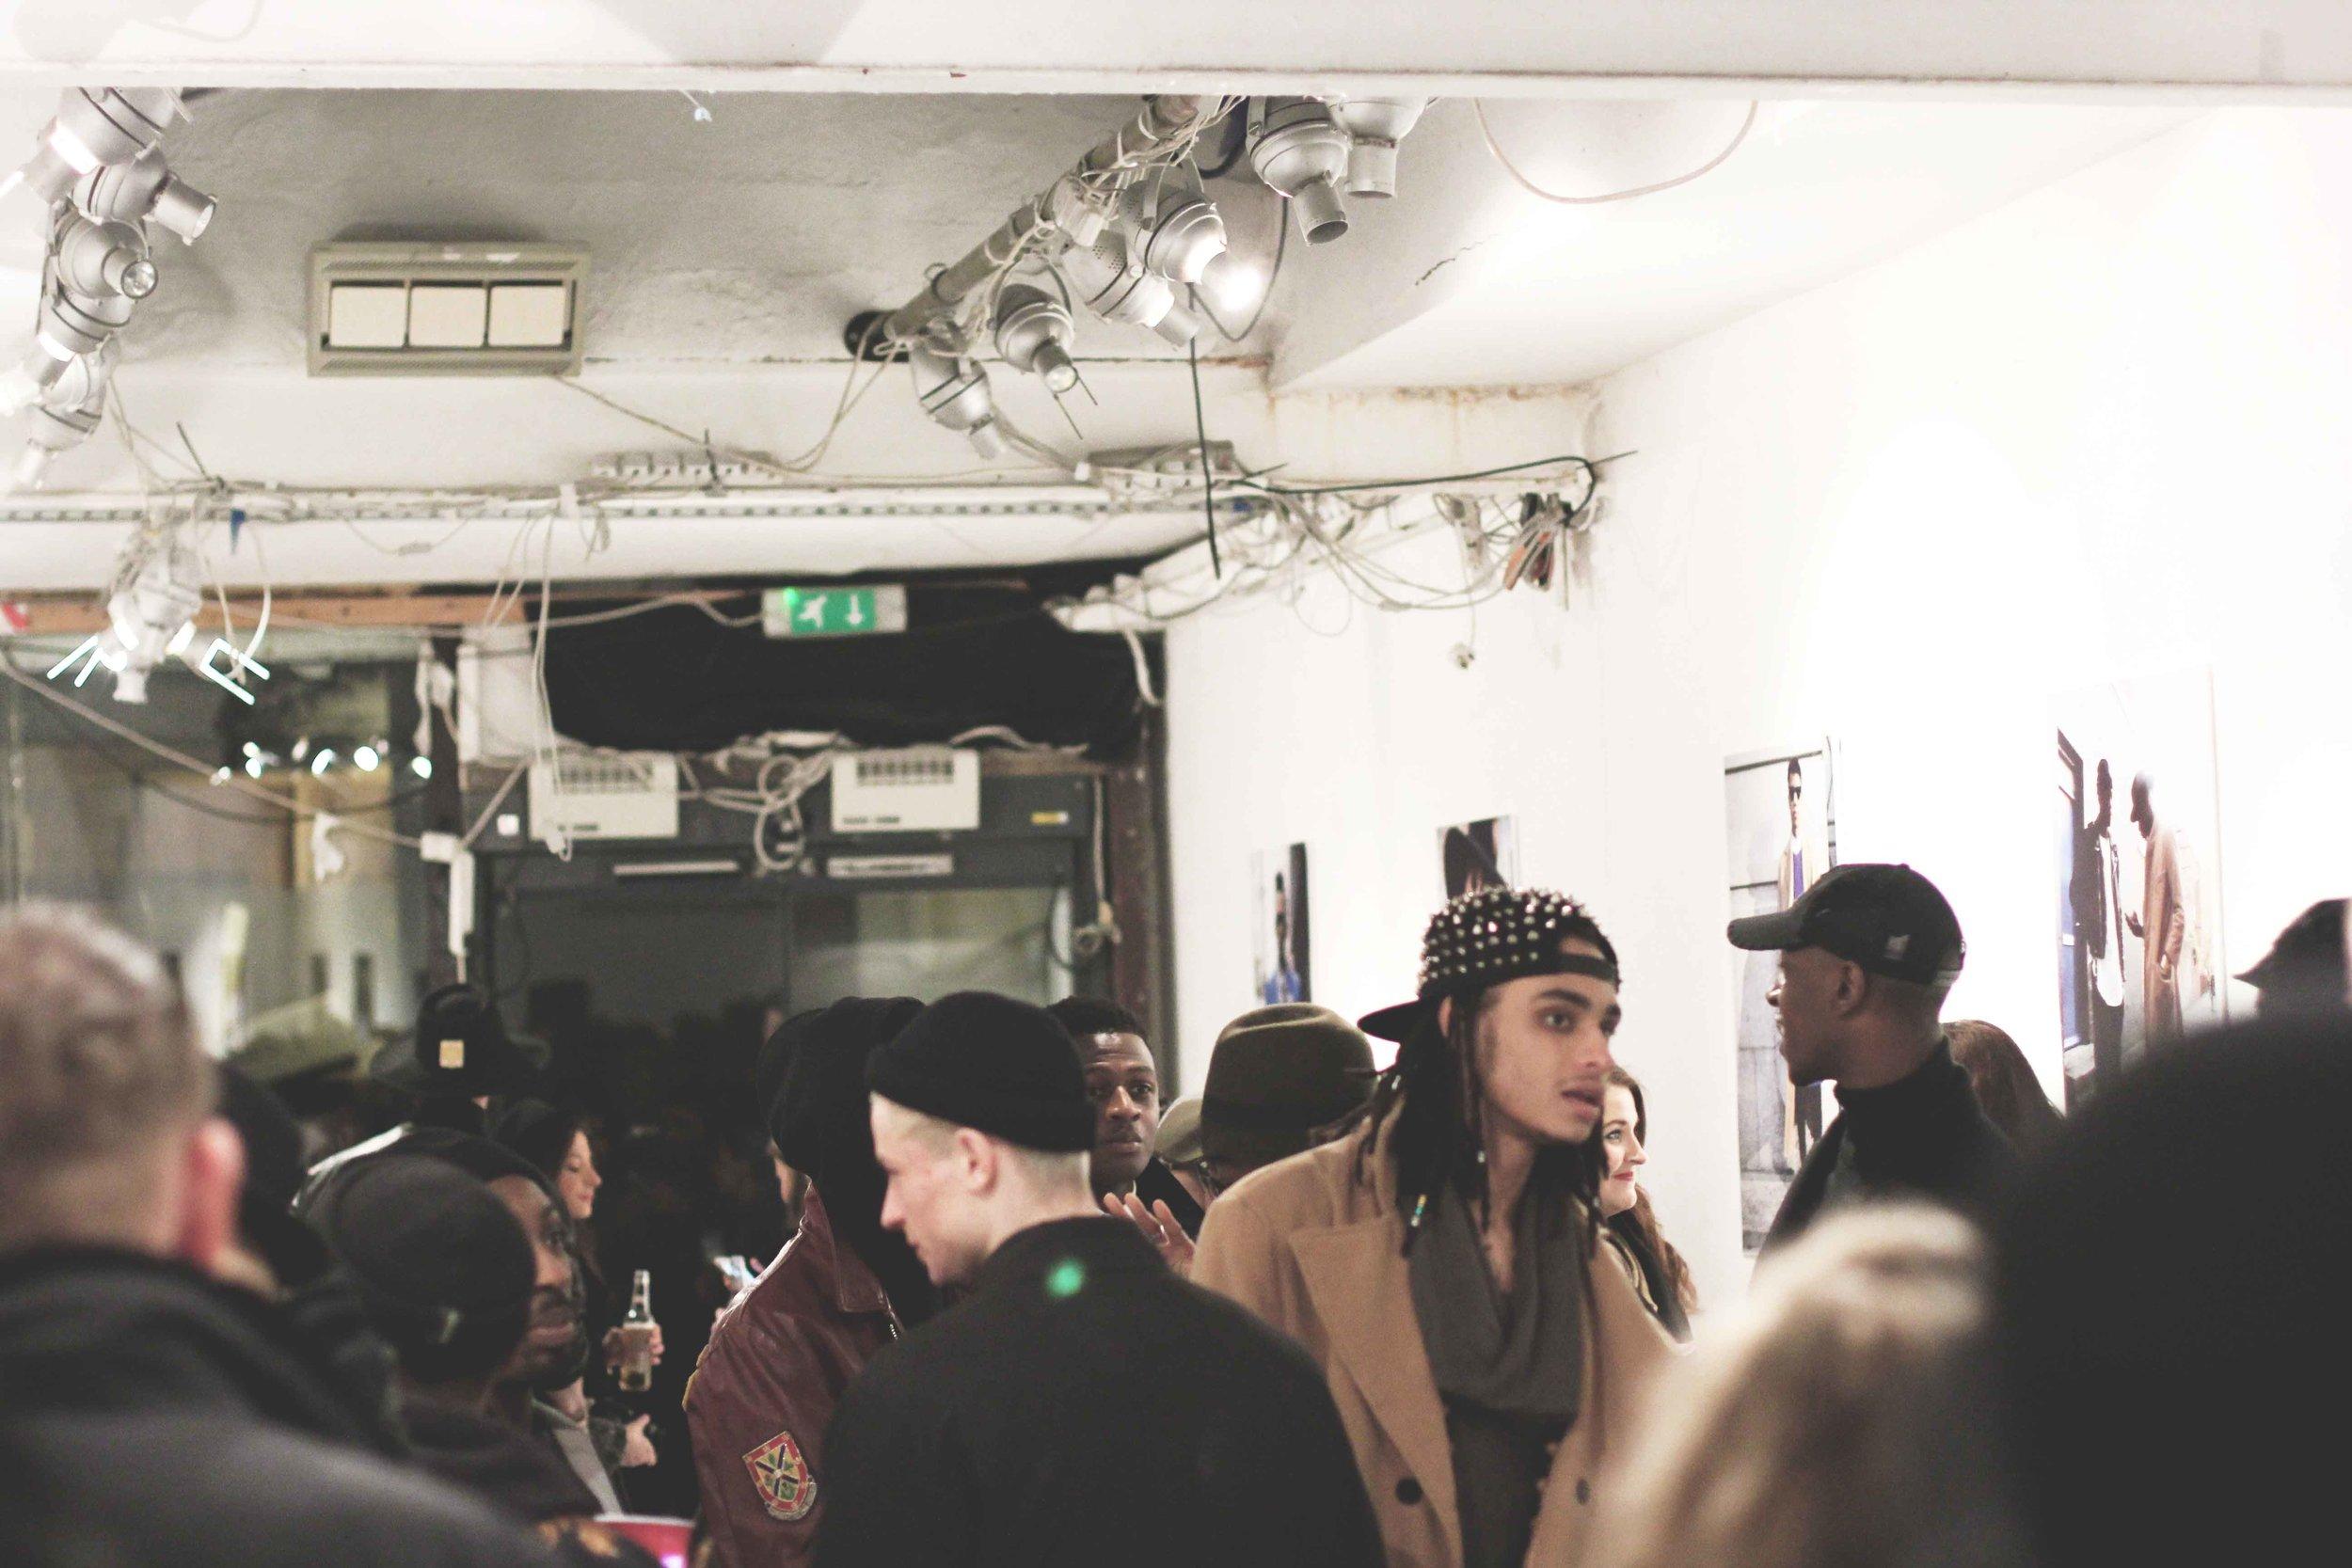 Jordan_Bunker_PAUSE_street_style_exhibition_13.jpg